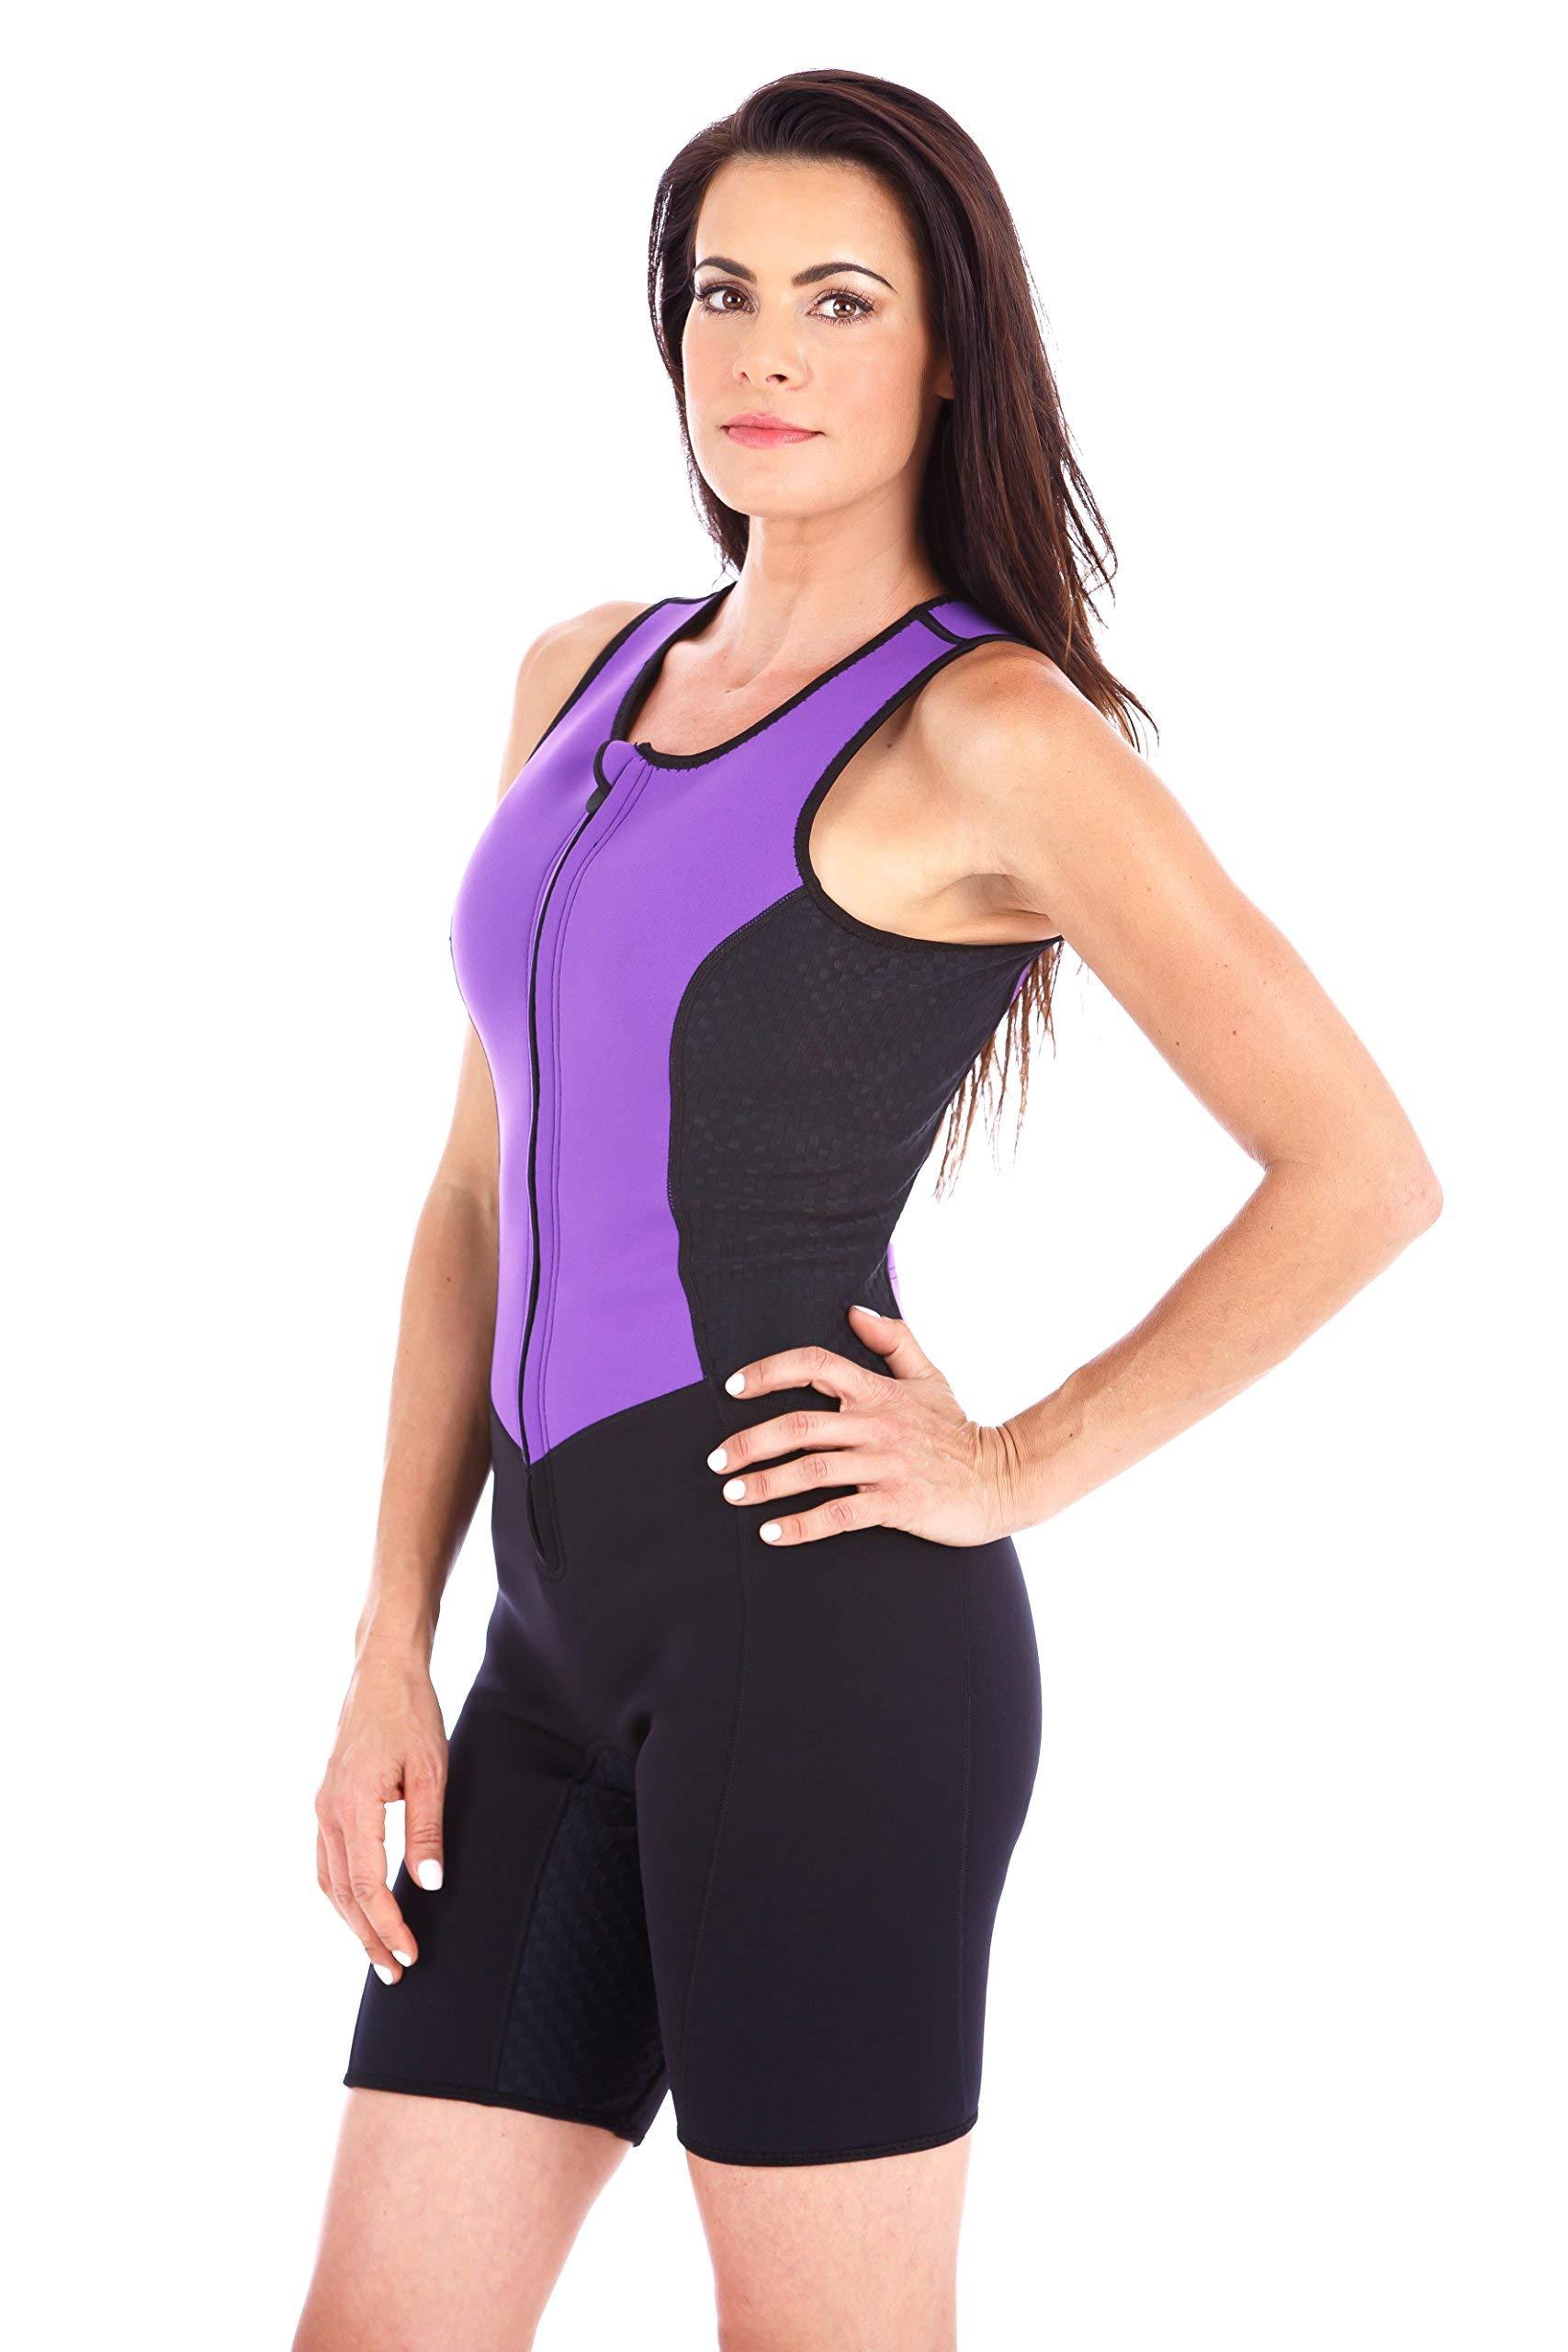 Kutting Weight Sauna Suit For Women Neoprene Weight Loss